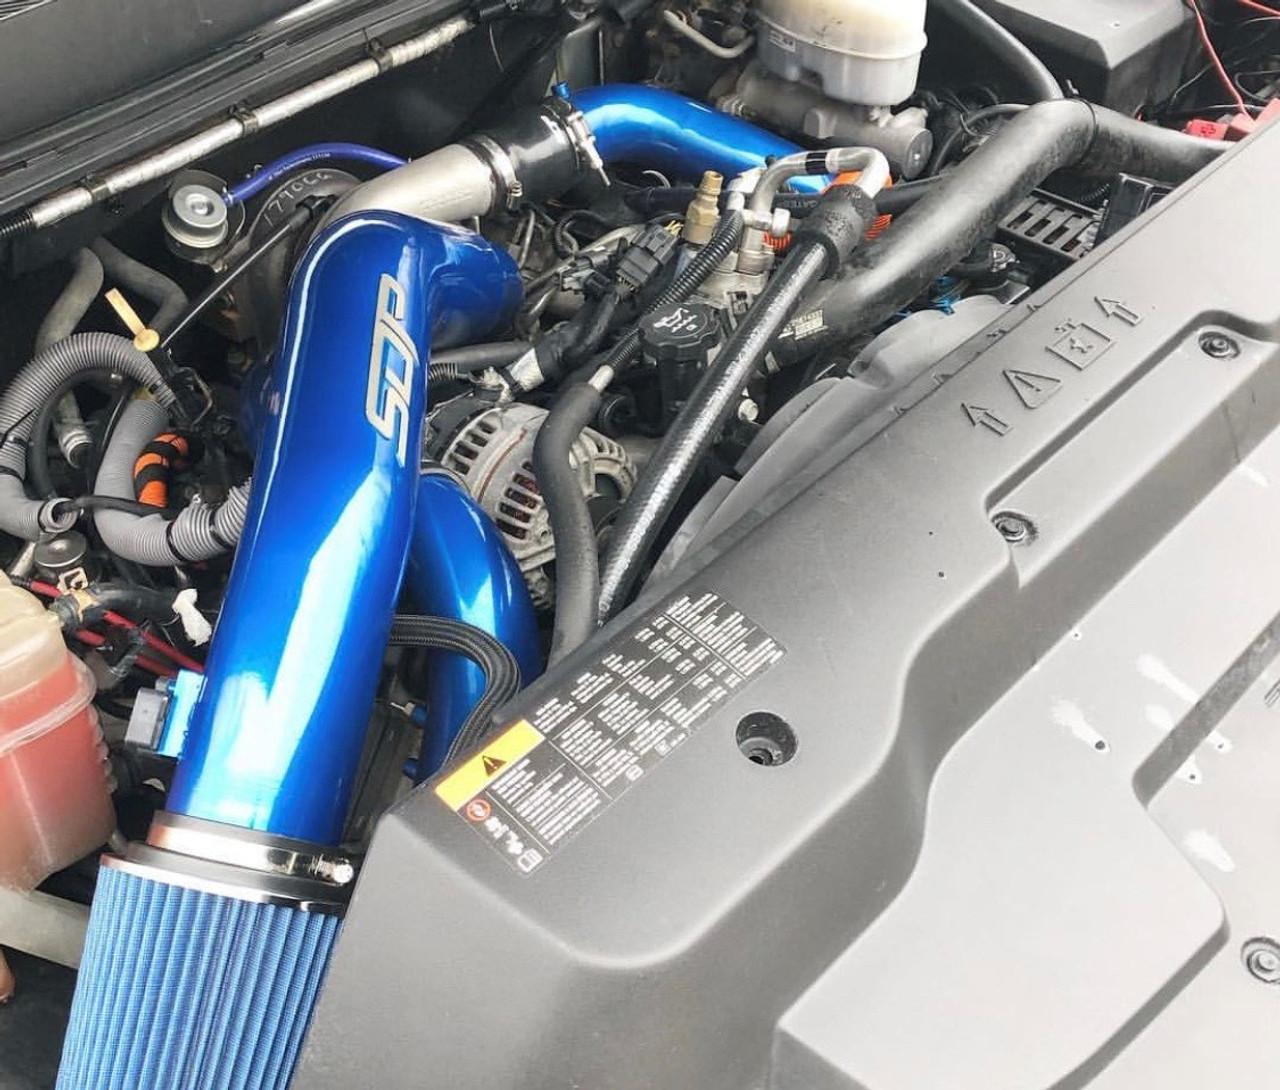 "Duramax LML 3"" Billet Y-bridge and intercooler pipe kit with 4"" intake (includes drivers side intercooler pipe option)"